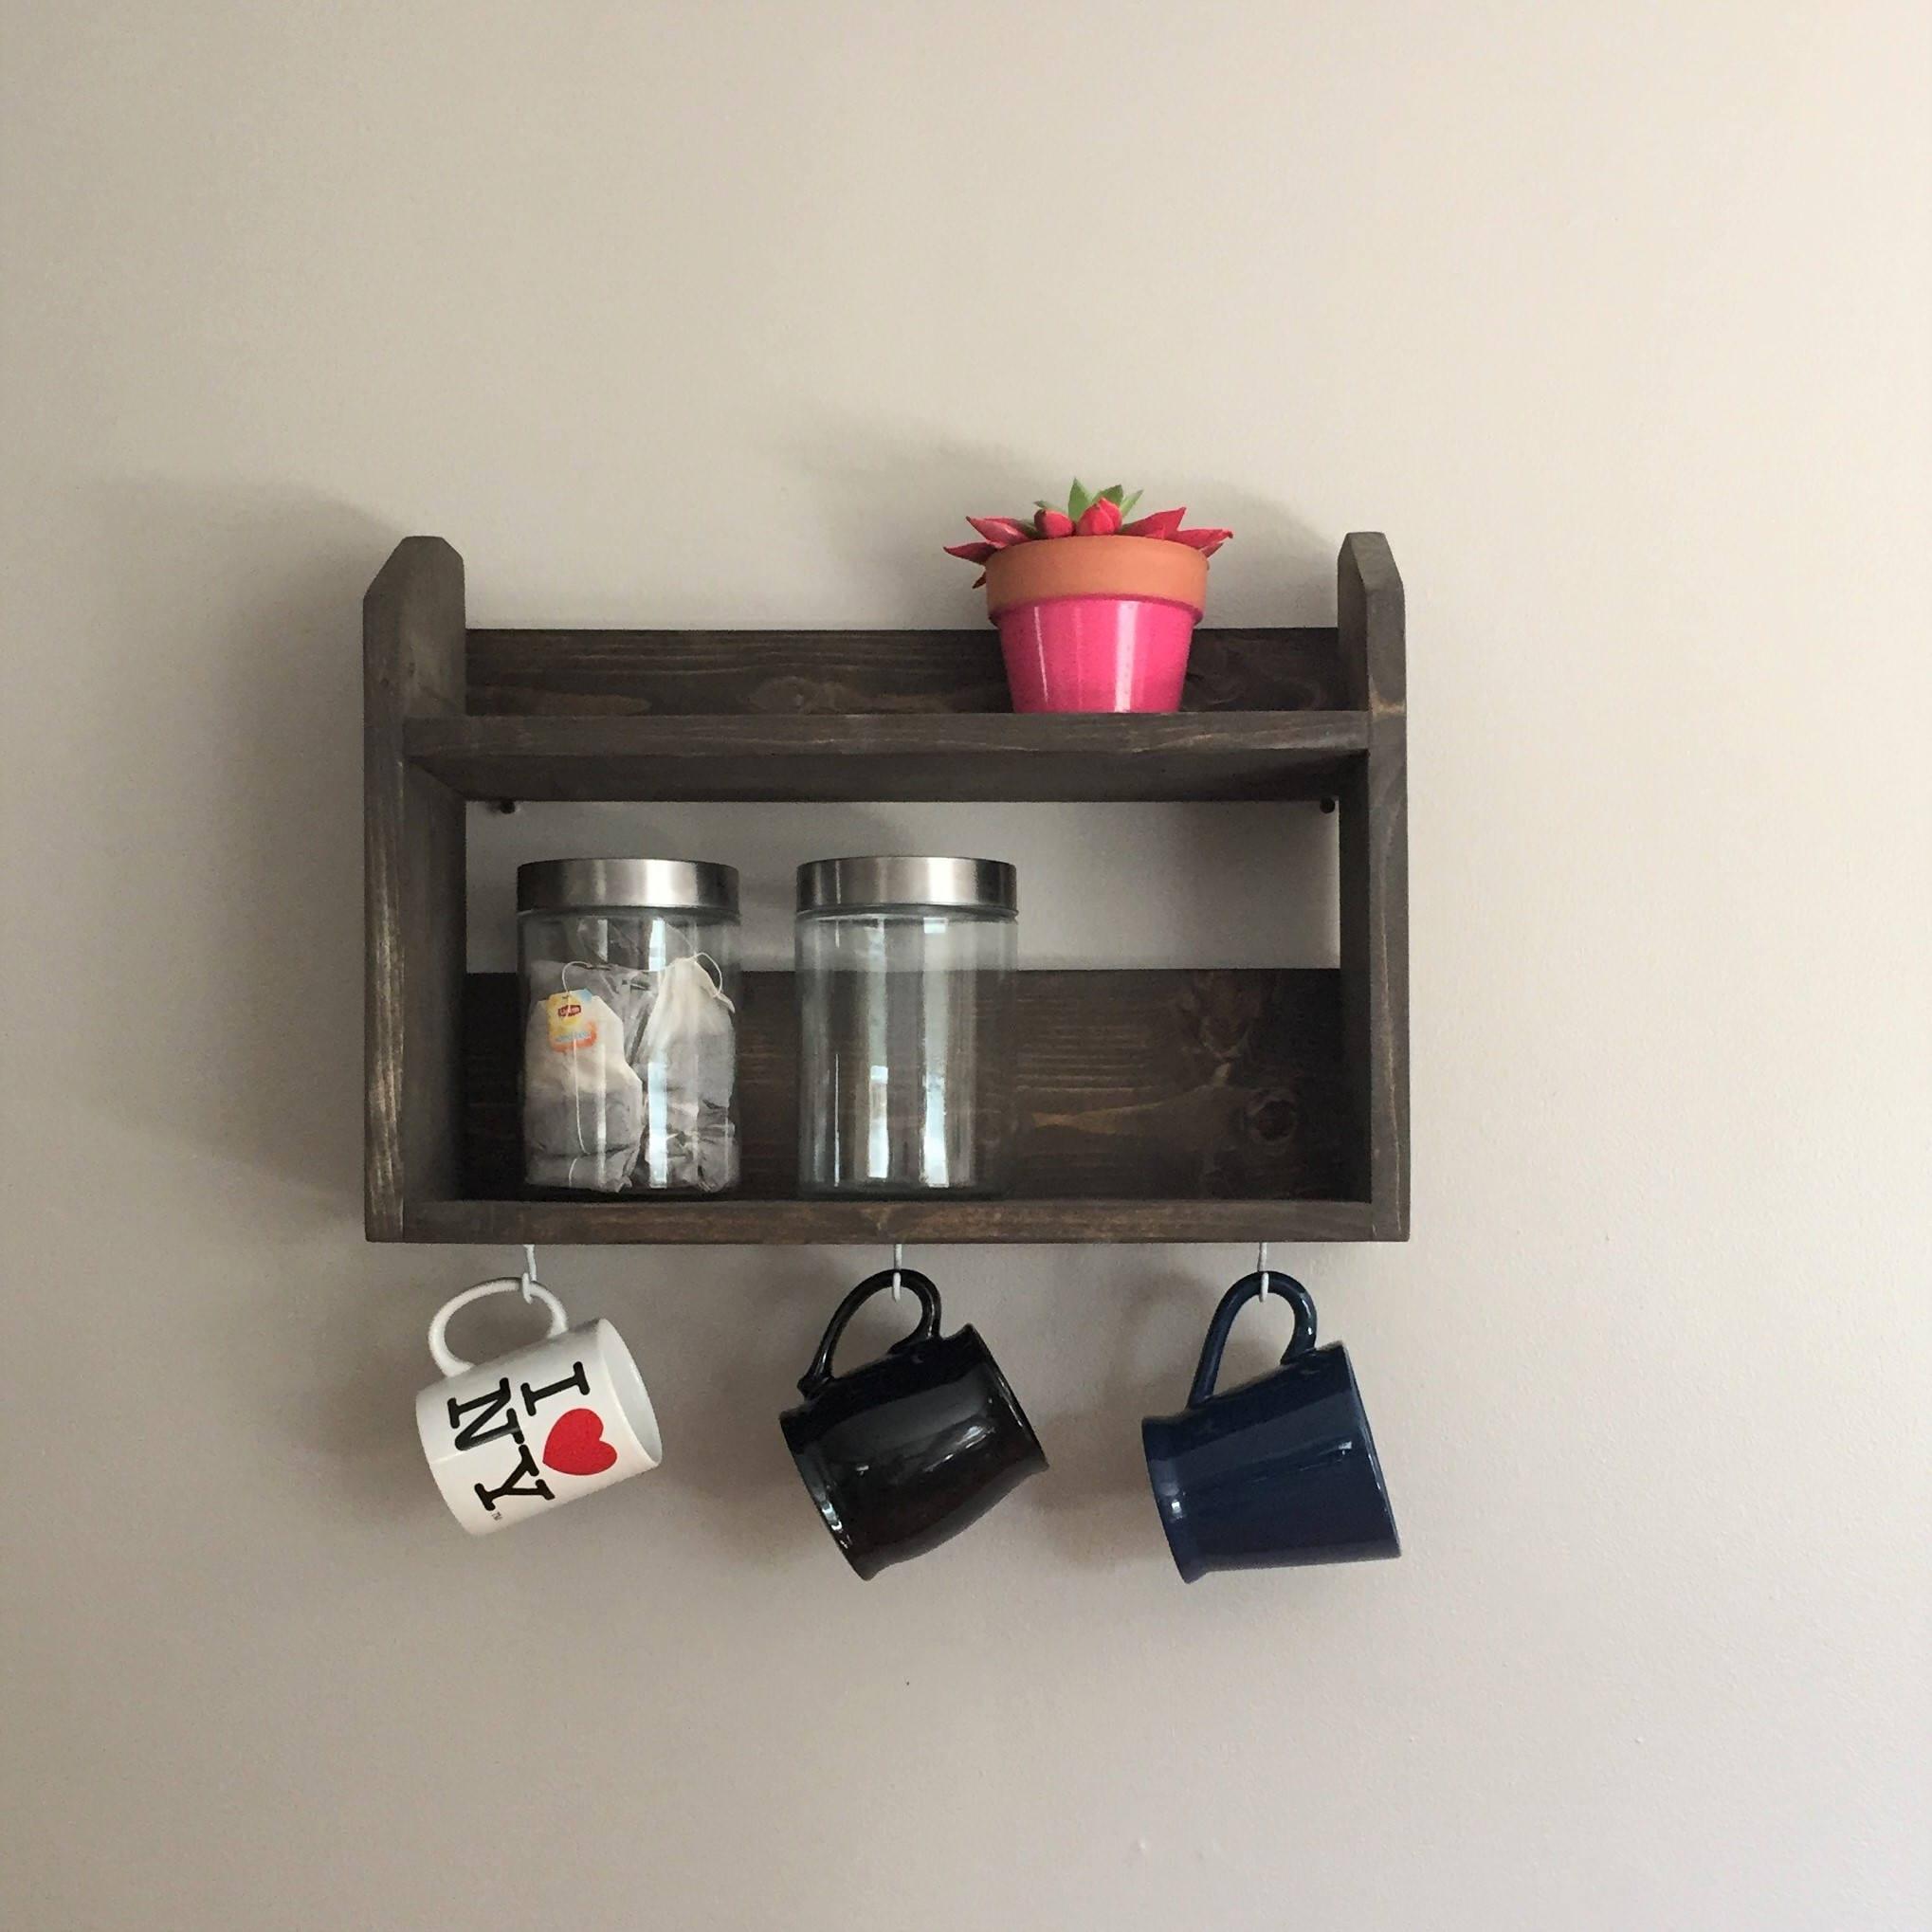 Café-Bar Kaffee-Regal Regal Kaffee-Liebhaber Tee-Regal | Etsy